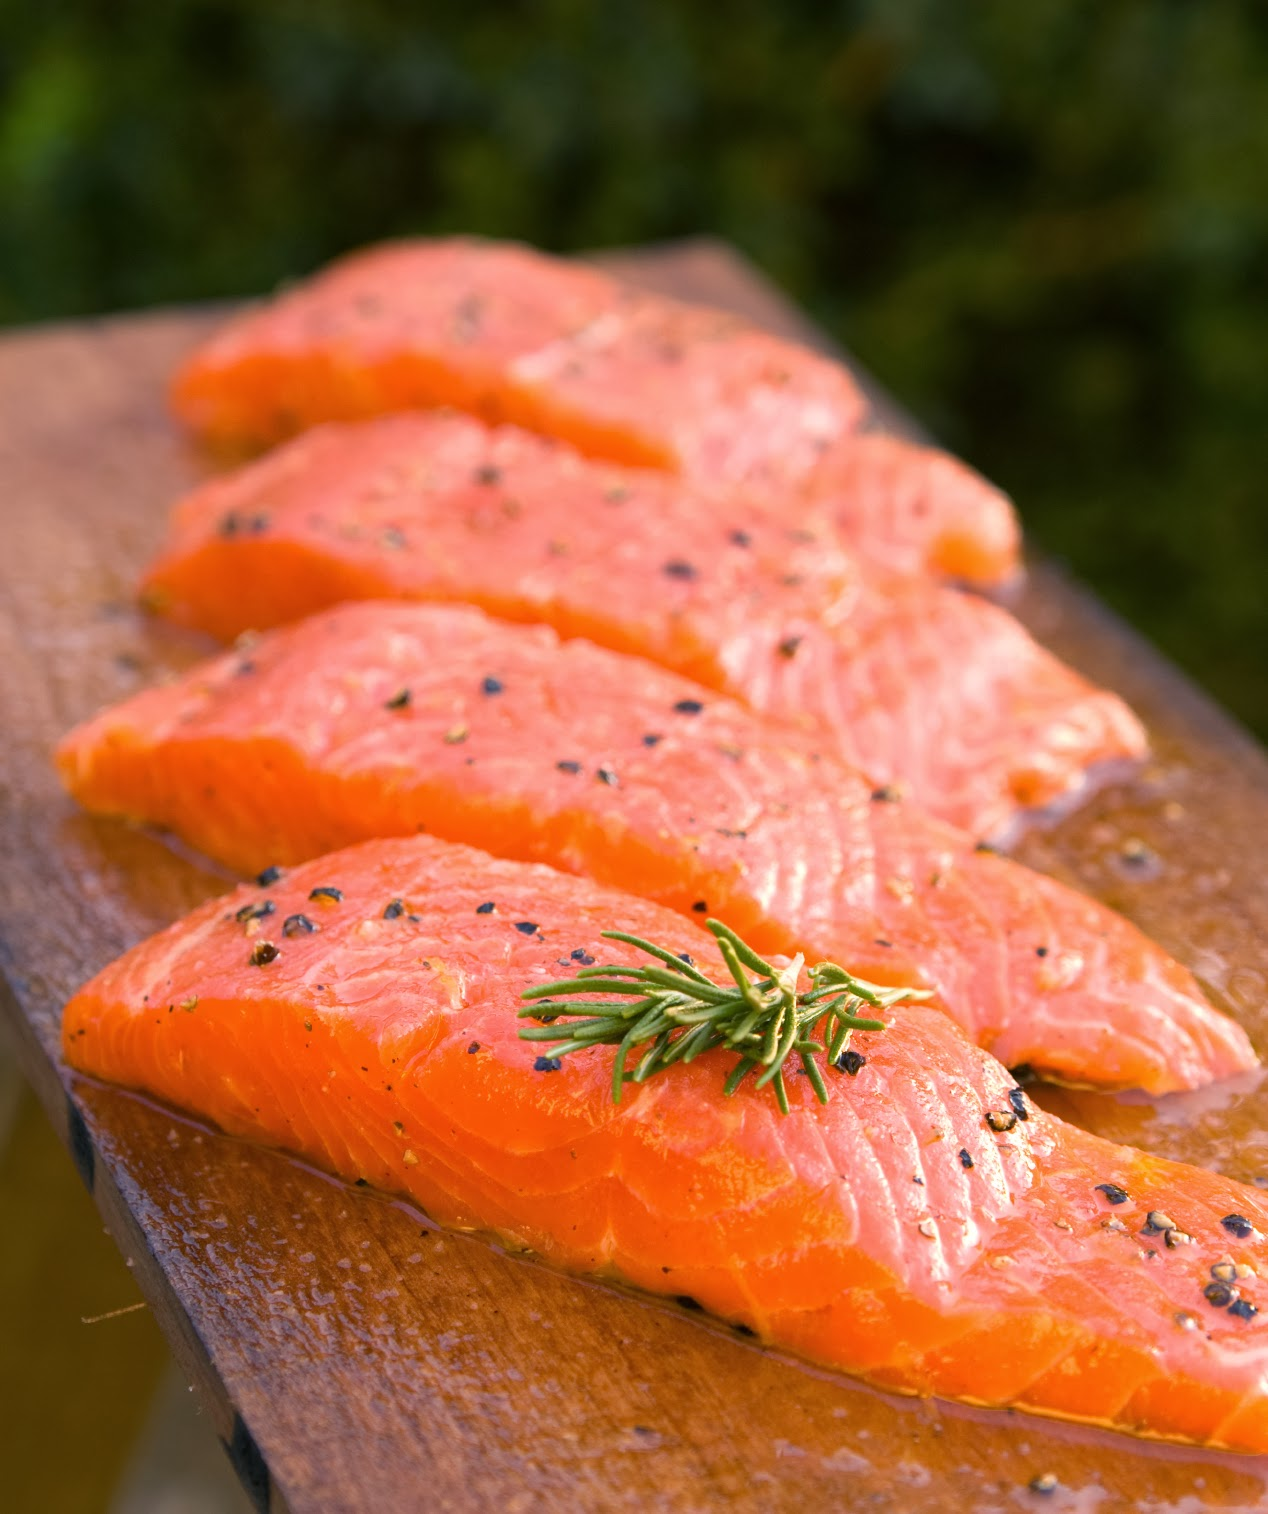 Salmon - The Source of ω - 3 (omega 3) fatty acids